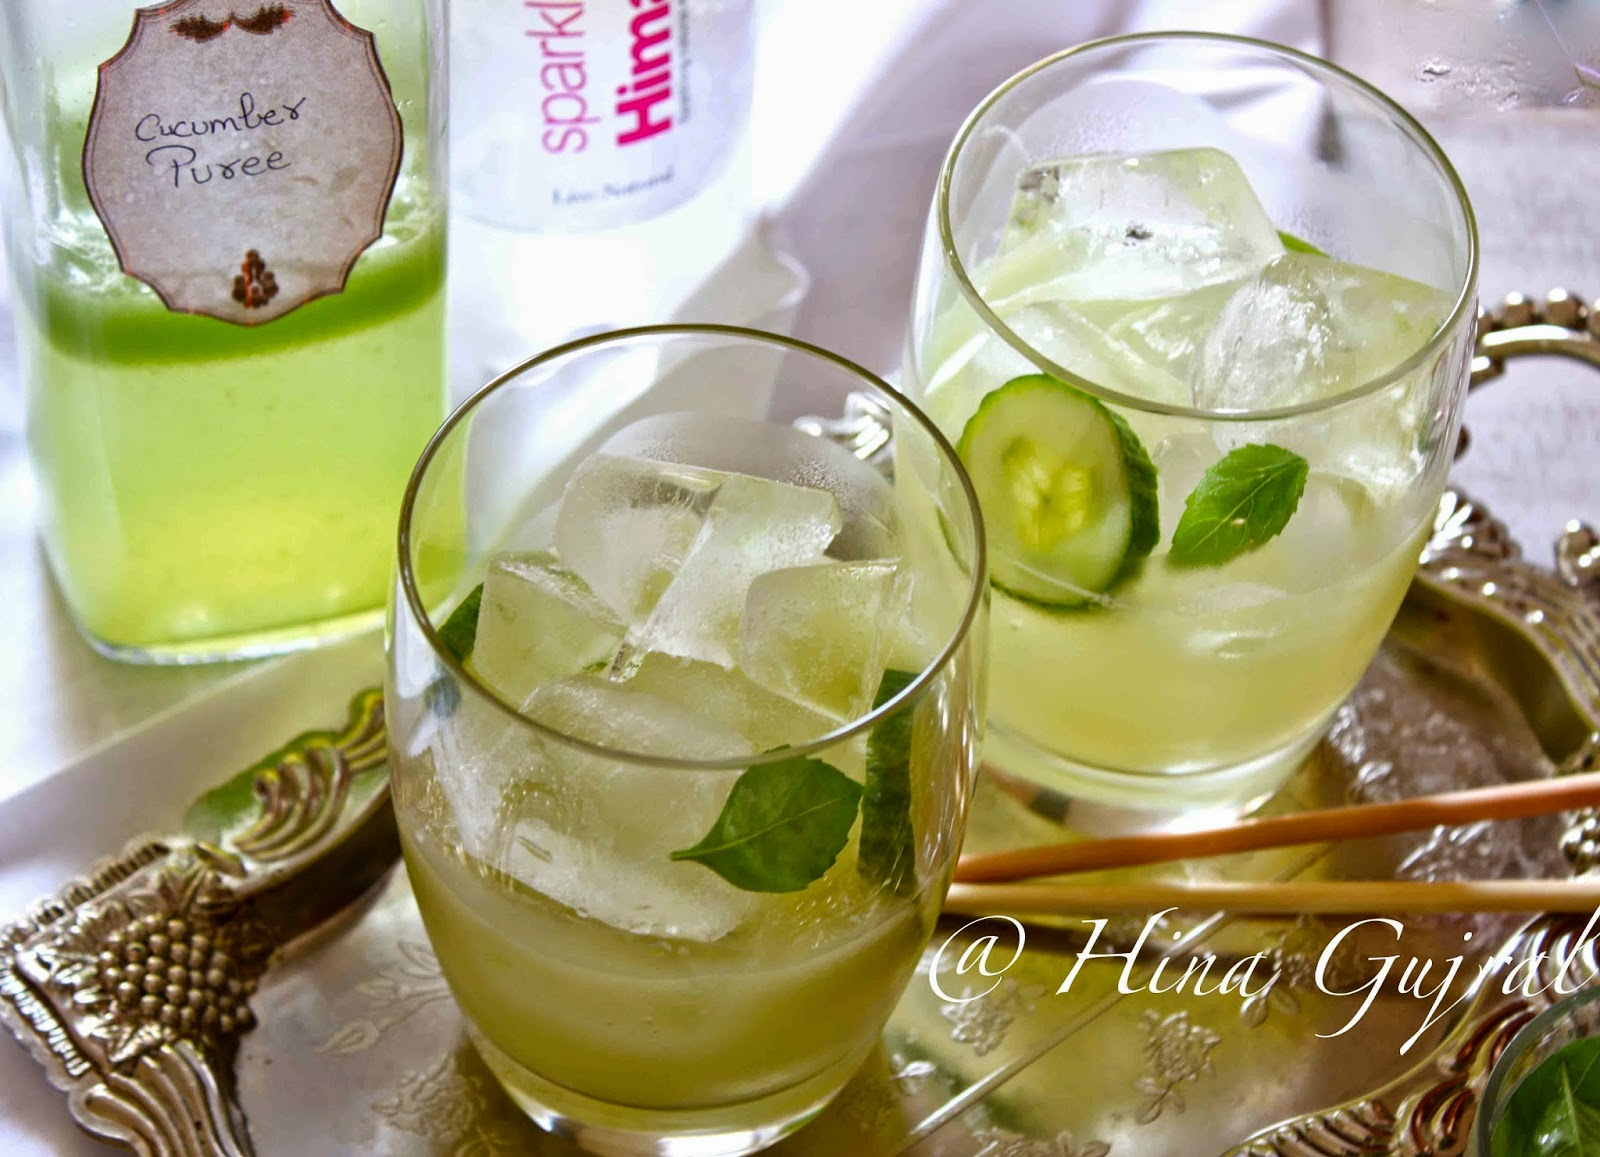 Cucumber Lemongrass Lemonade is an absolutely refreshing drink for the summer. Find Cucumber and Lemongrass Lemonade Recipe